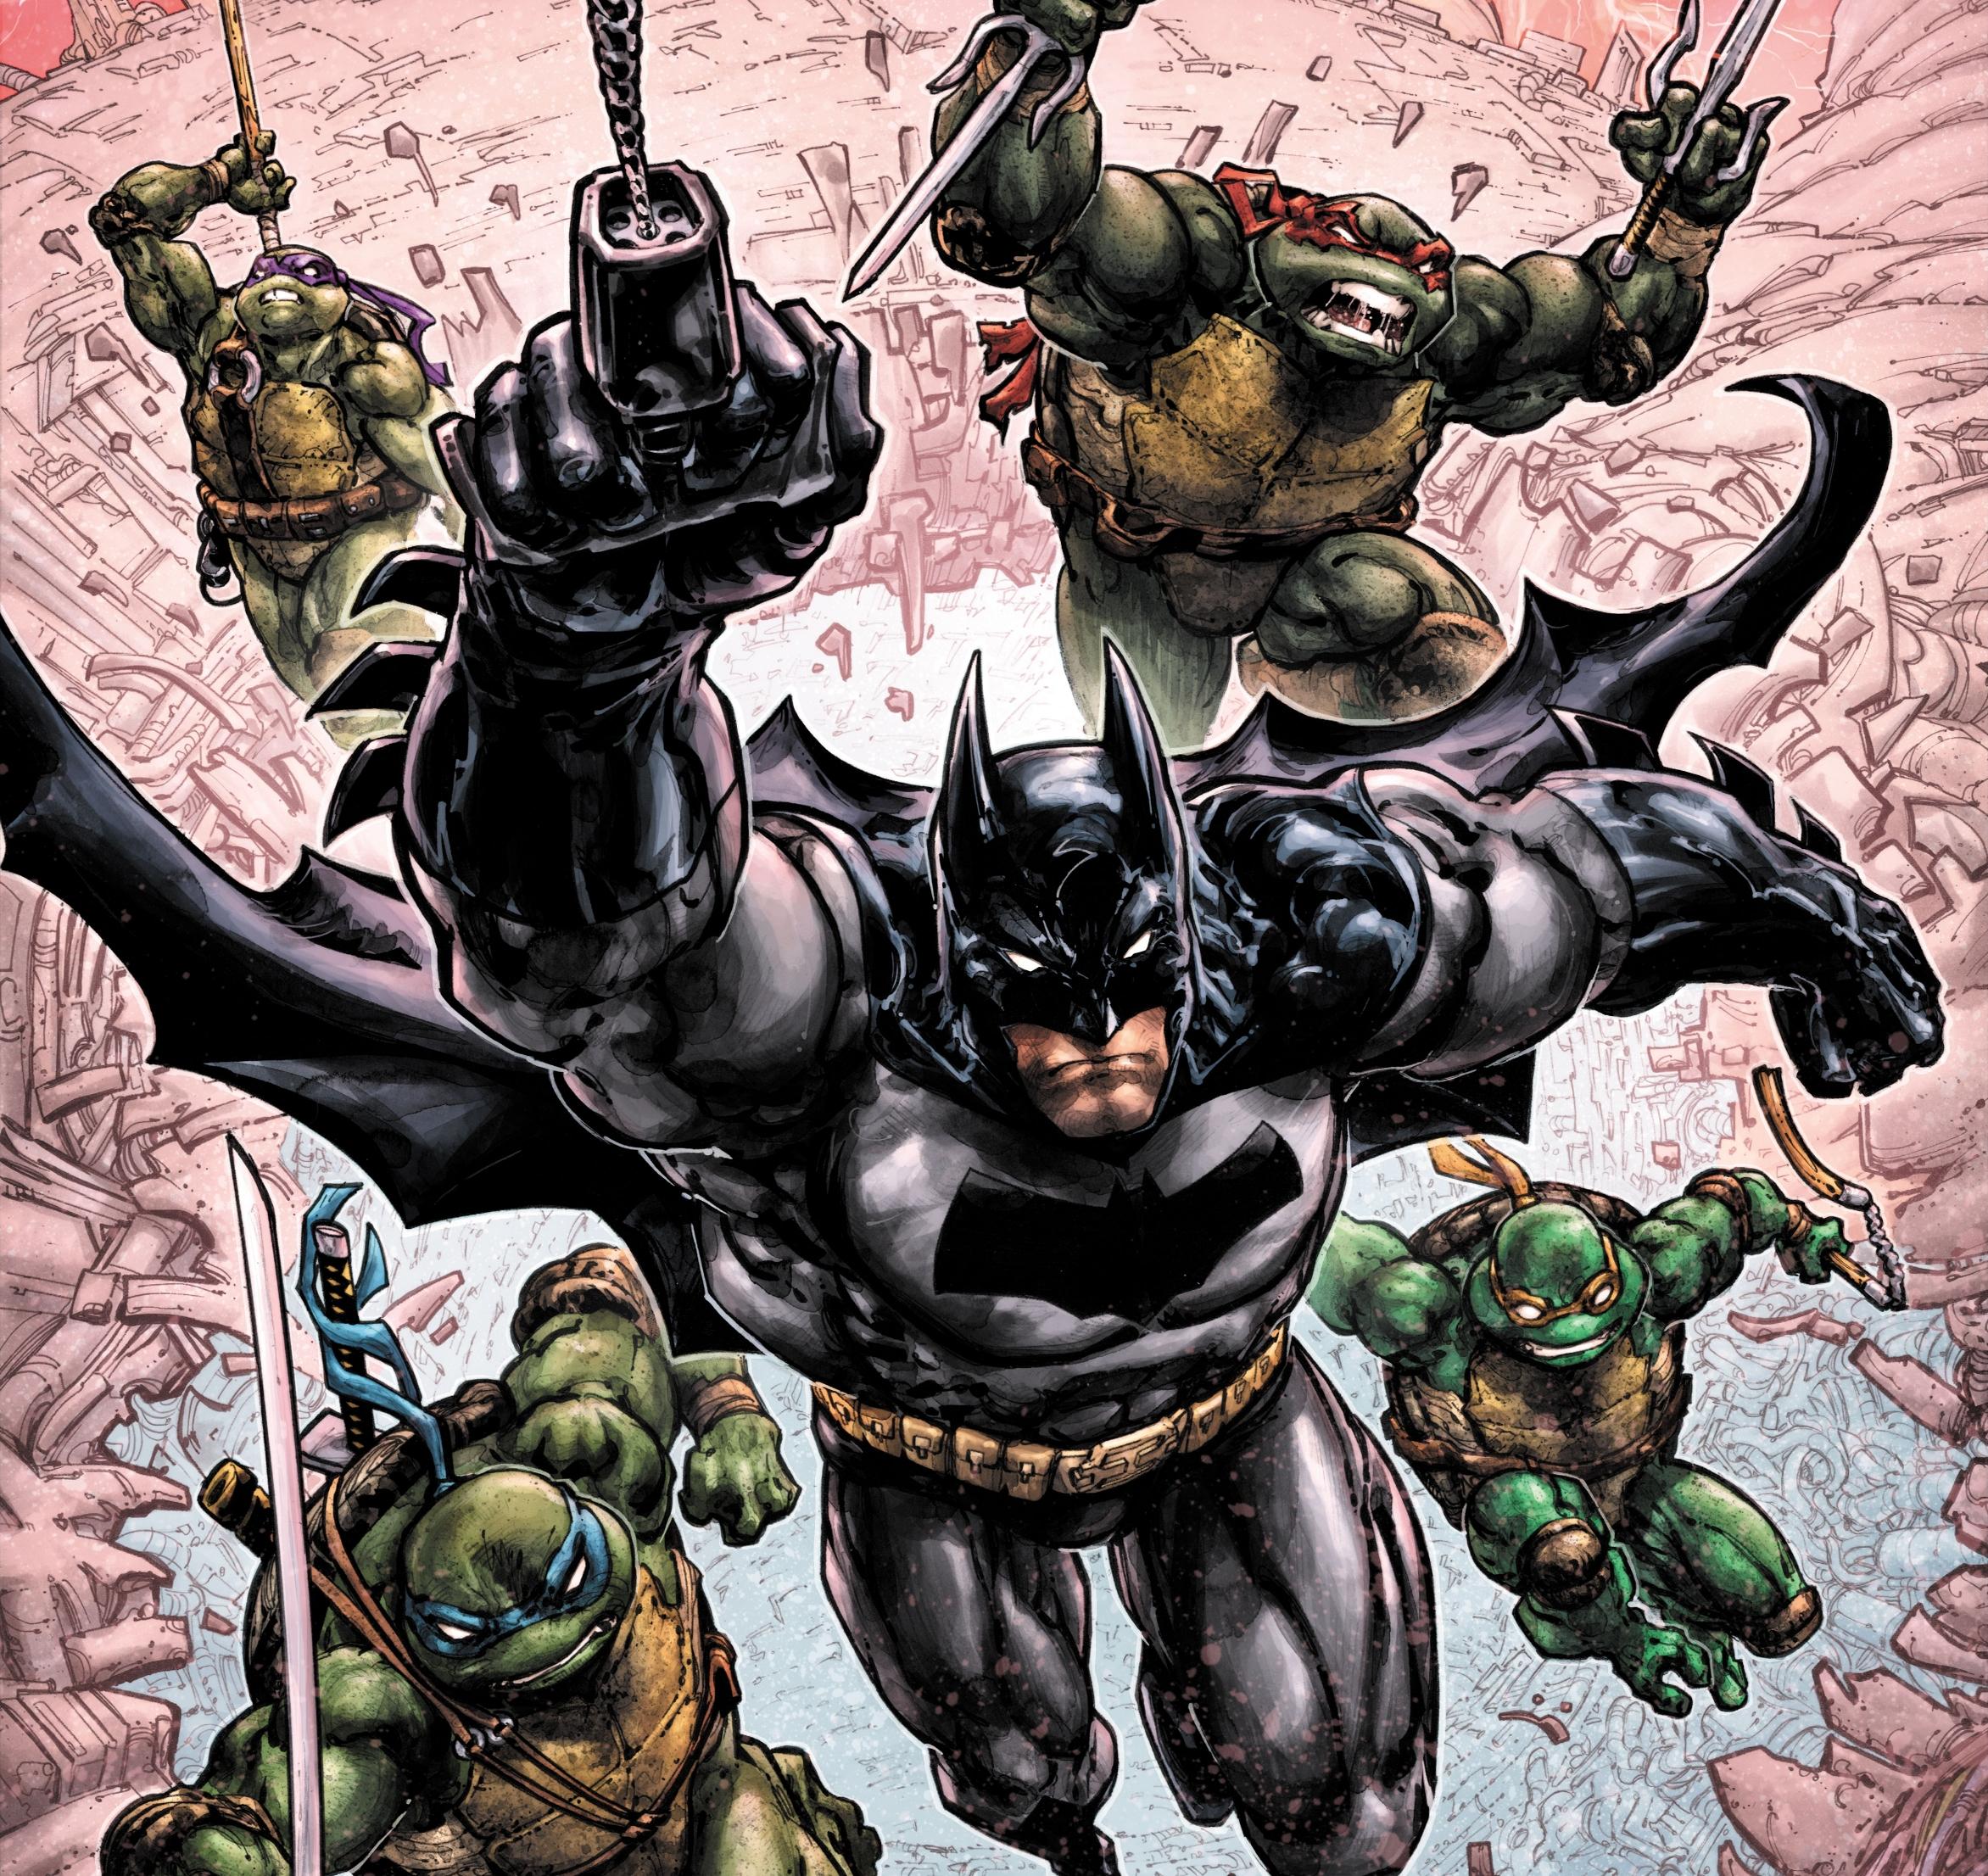 Batman Teenage Mutant Ninja Turtles Iii Coming This May Den Of Geek